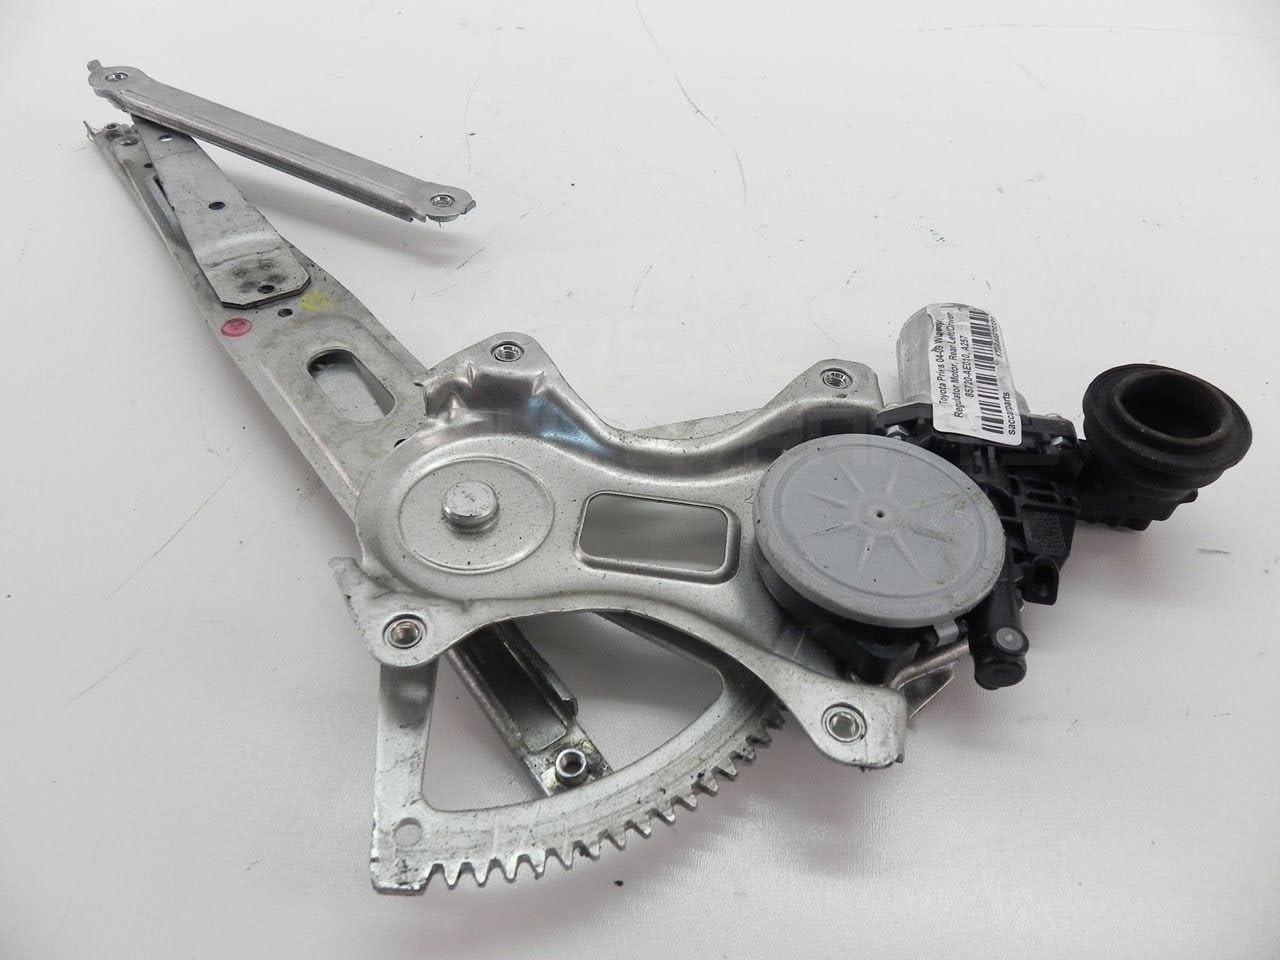 Genuine Toyota 85720-32150 Power Window Motor Assembly